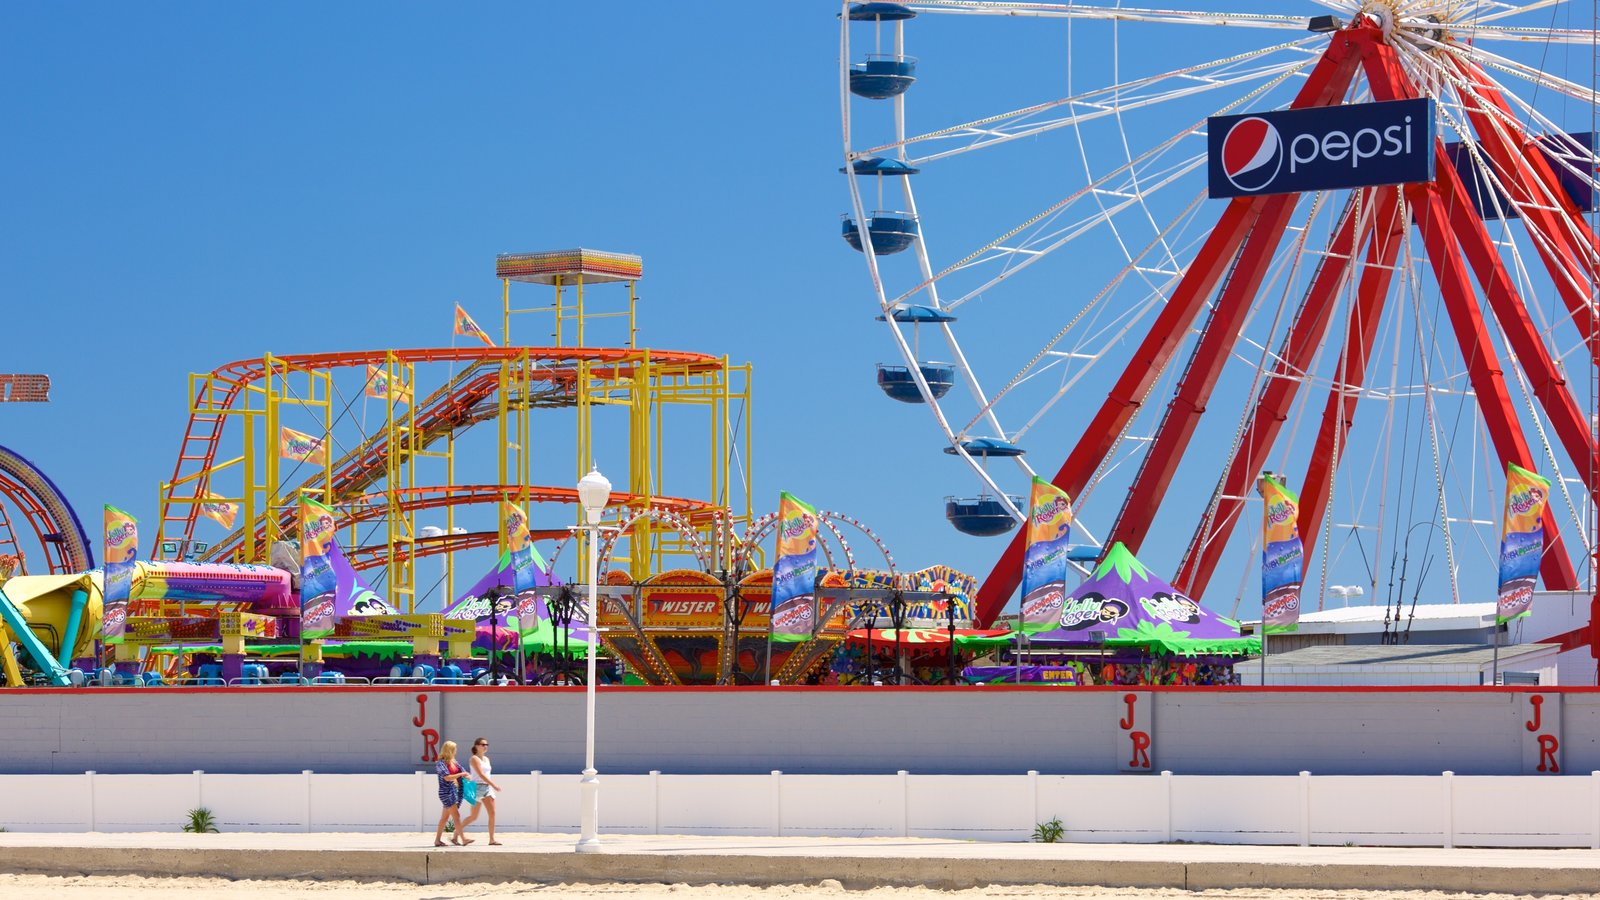 Ocean City Boardwalk featuring rides